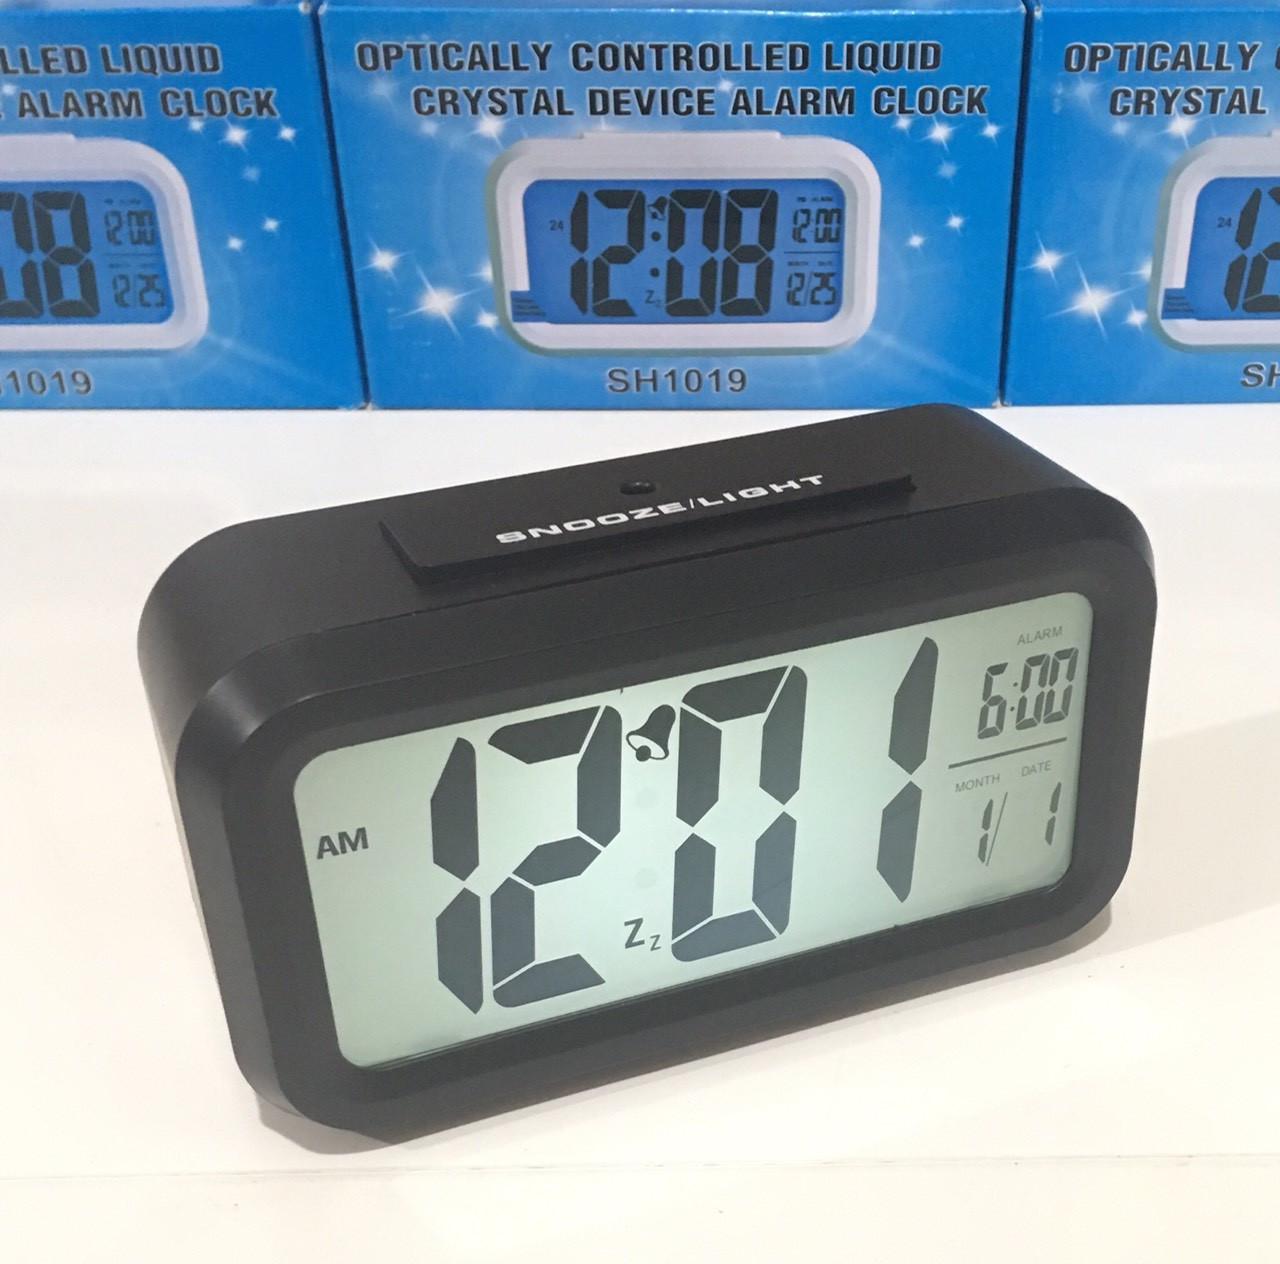 Настольные часы с подсветкой на батарейках MOD-1019